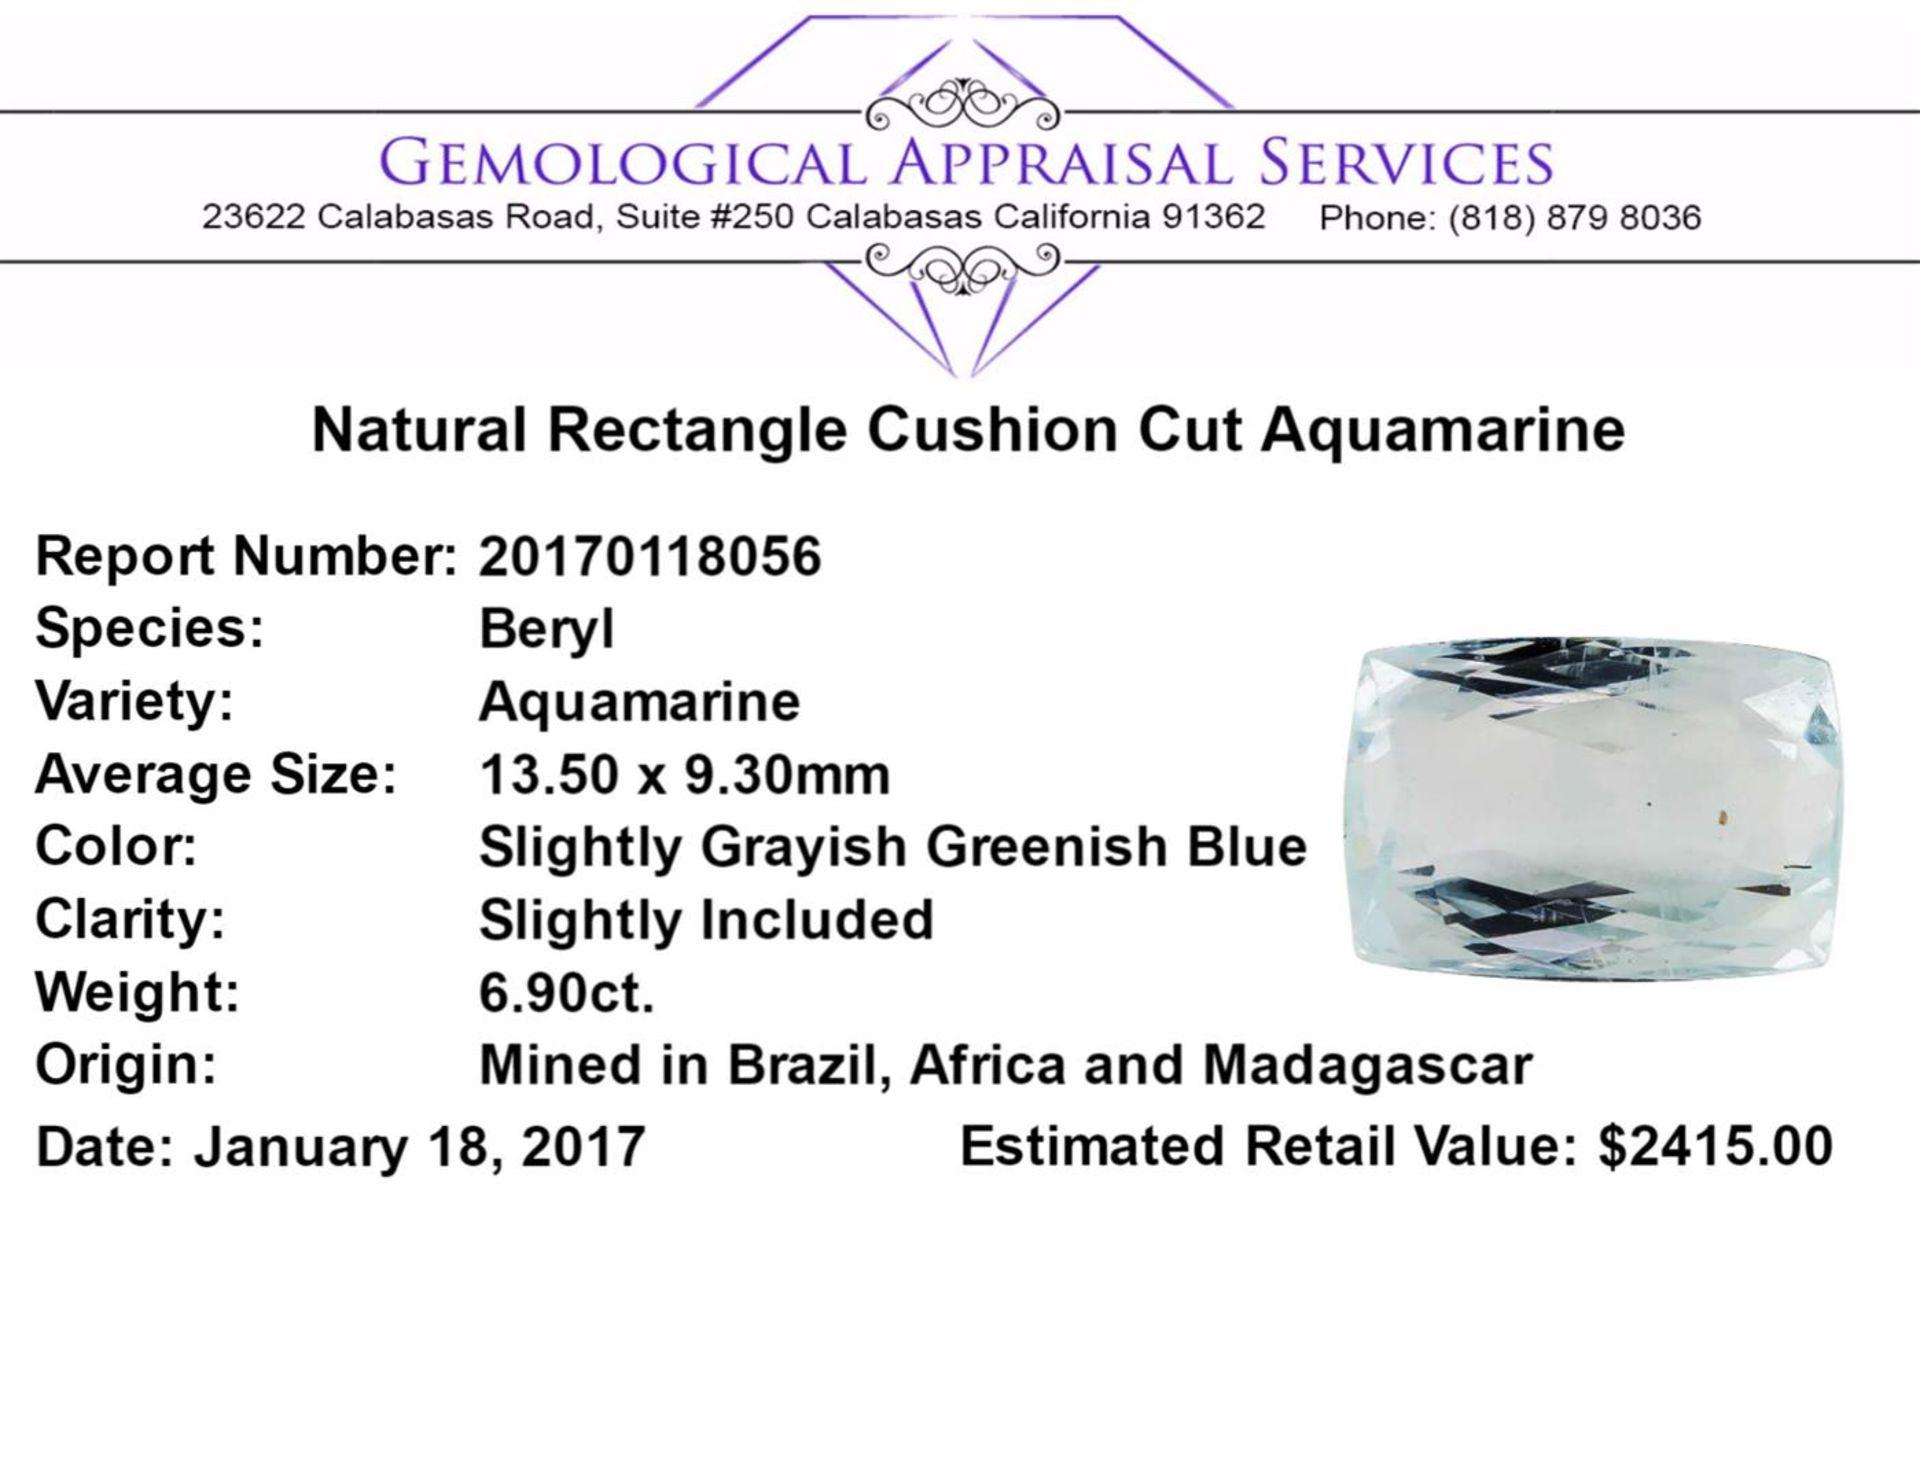 6.90 ct.Natural Rectangle Cushion Cut Aquamarine - Image 2 of 2